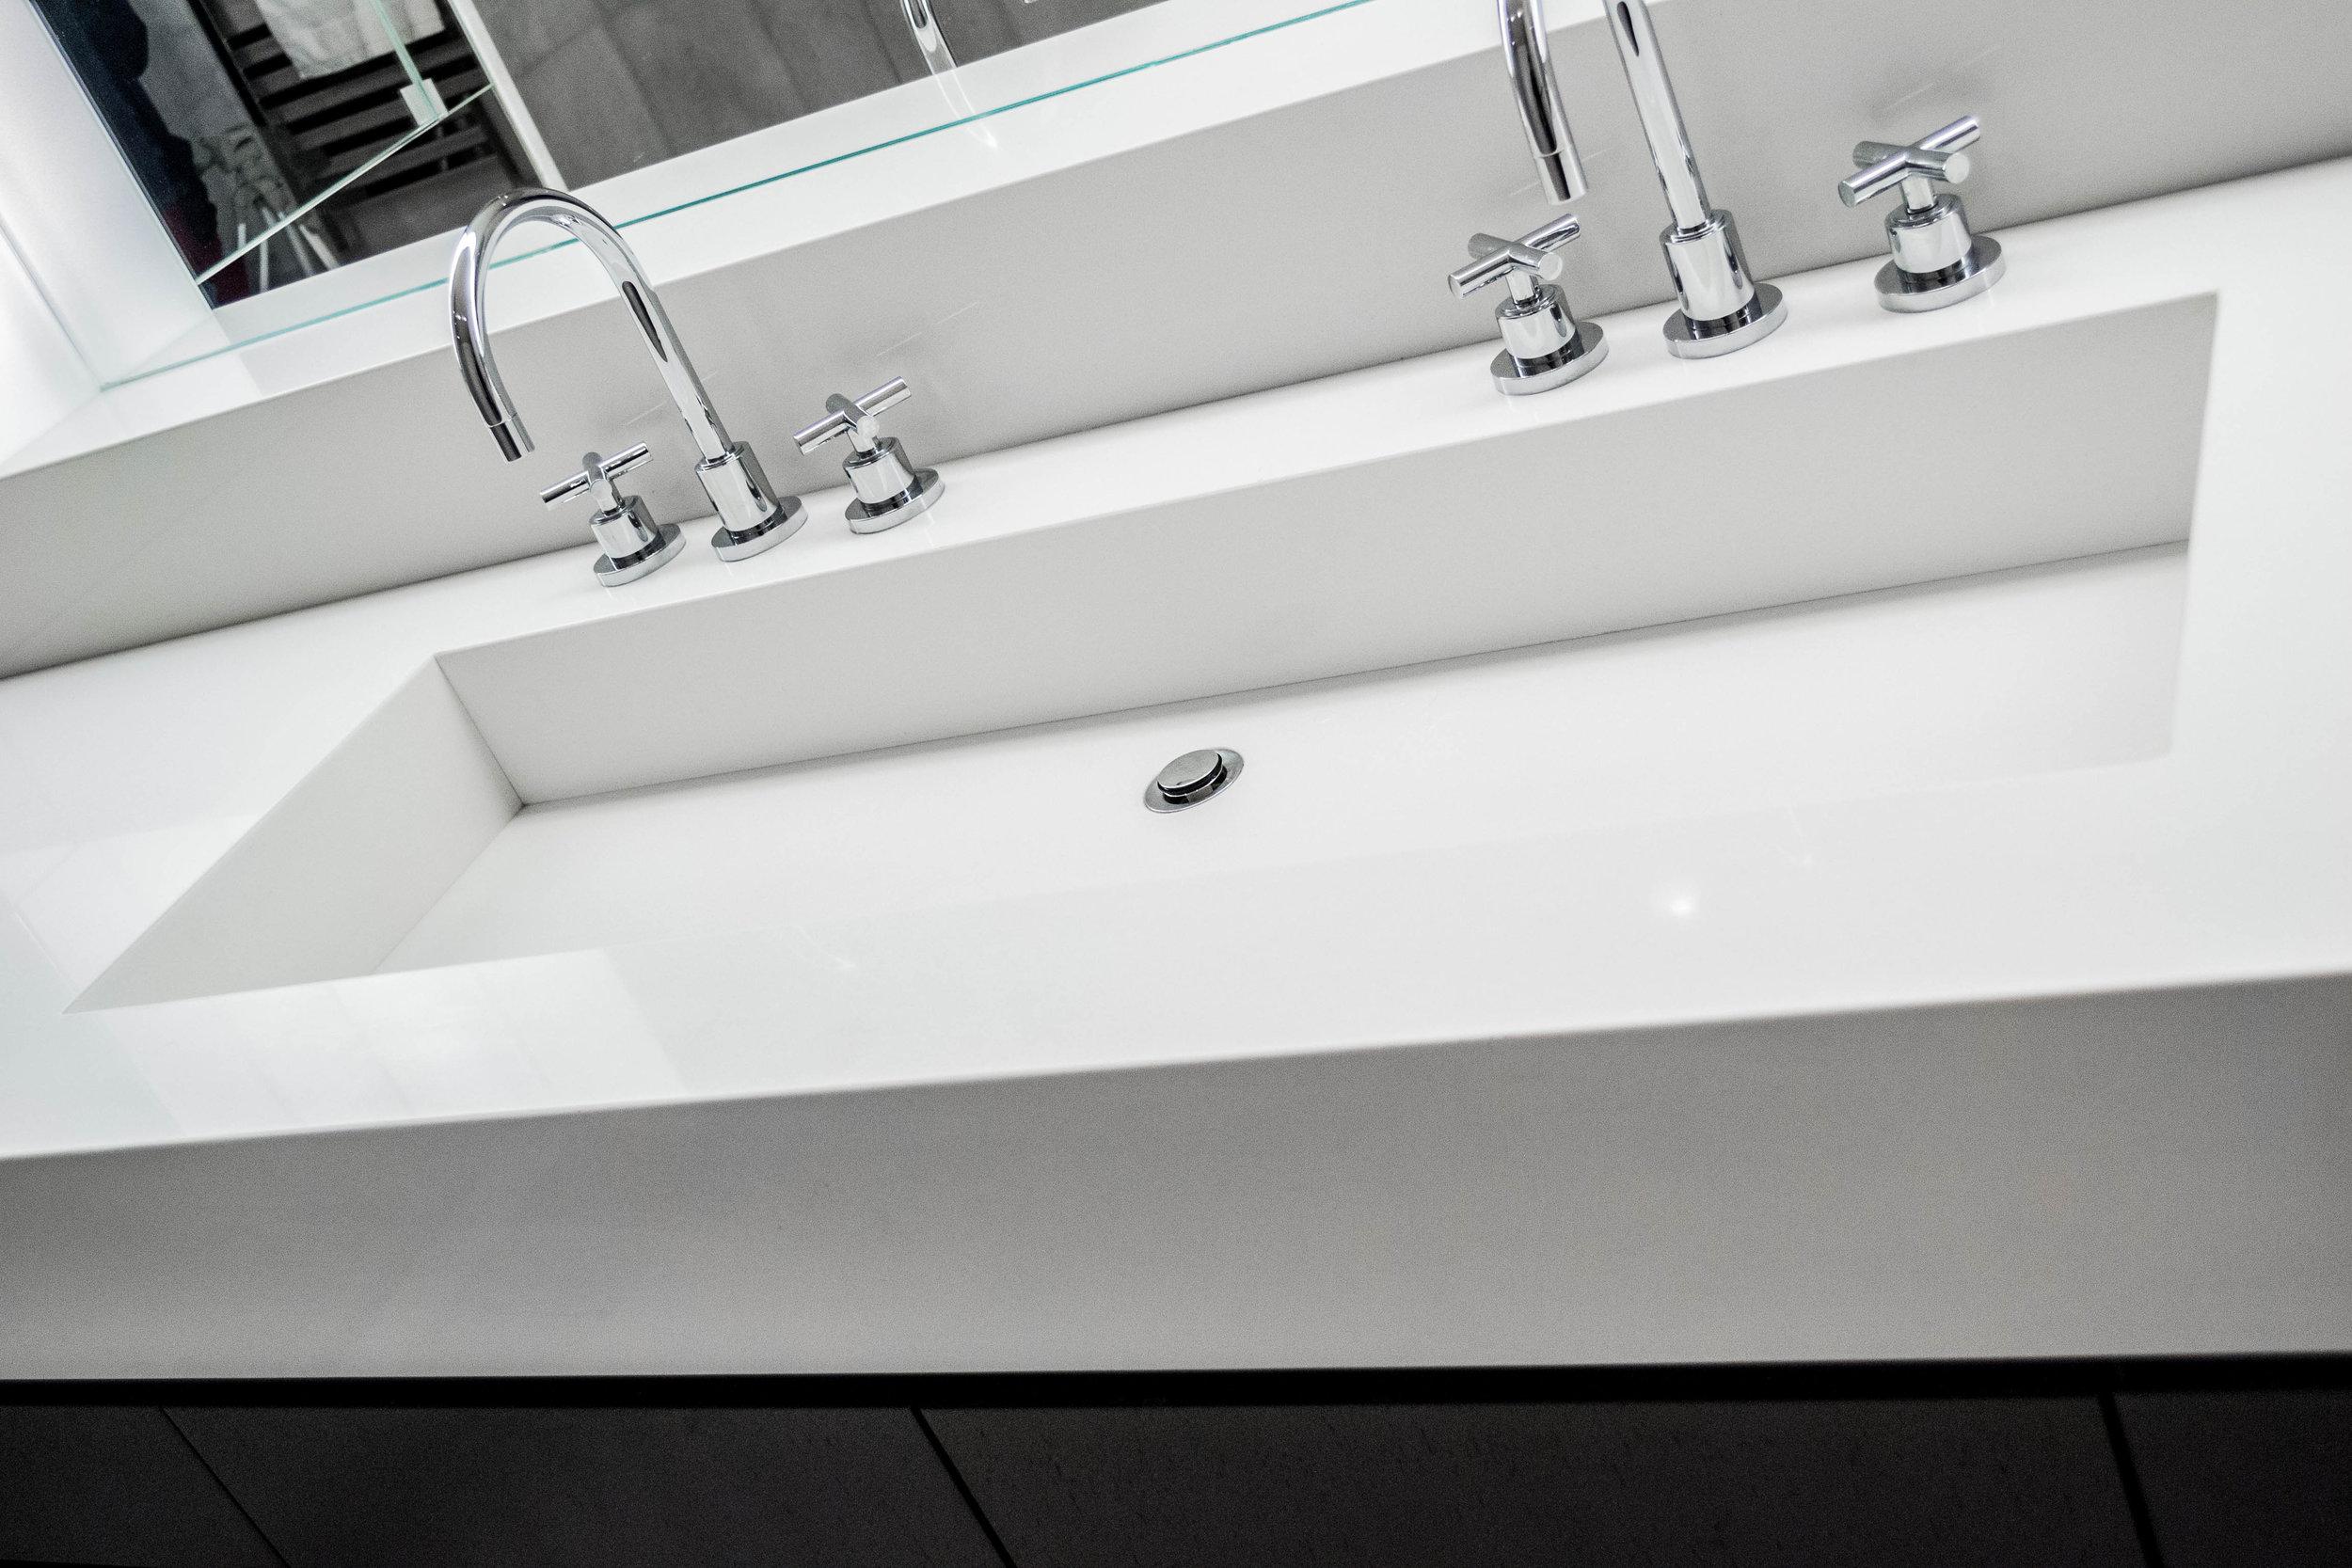 CQ901 Frost White Countertop